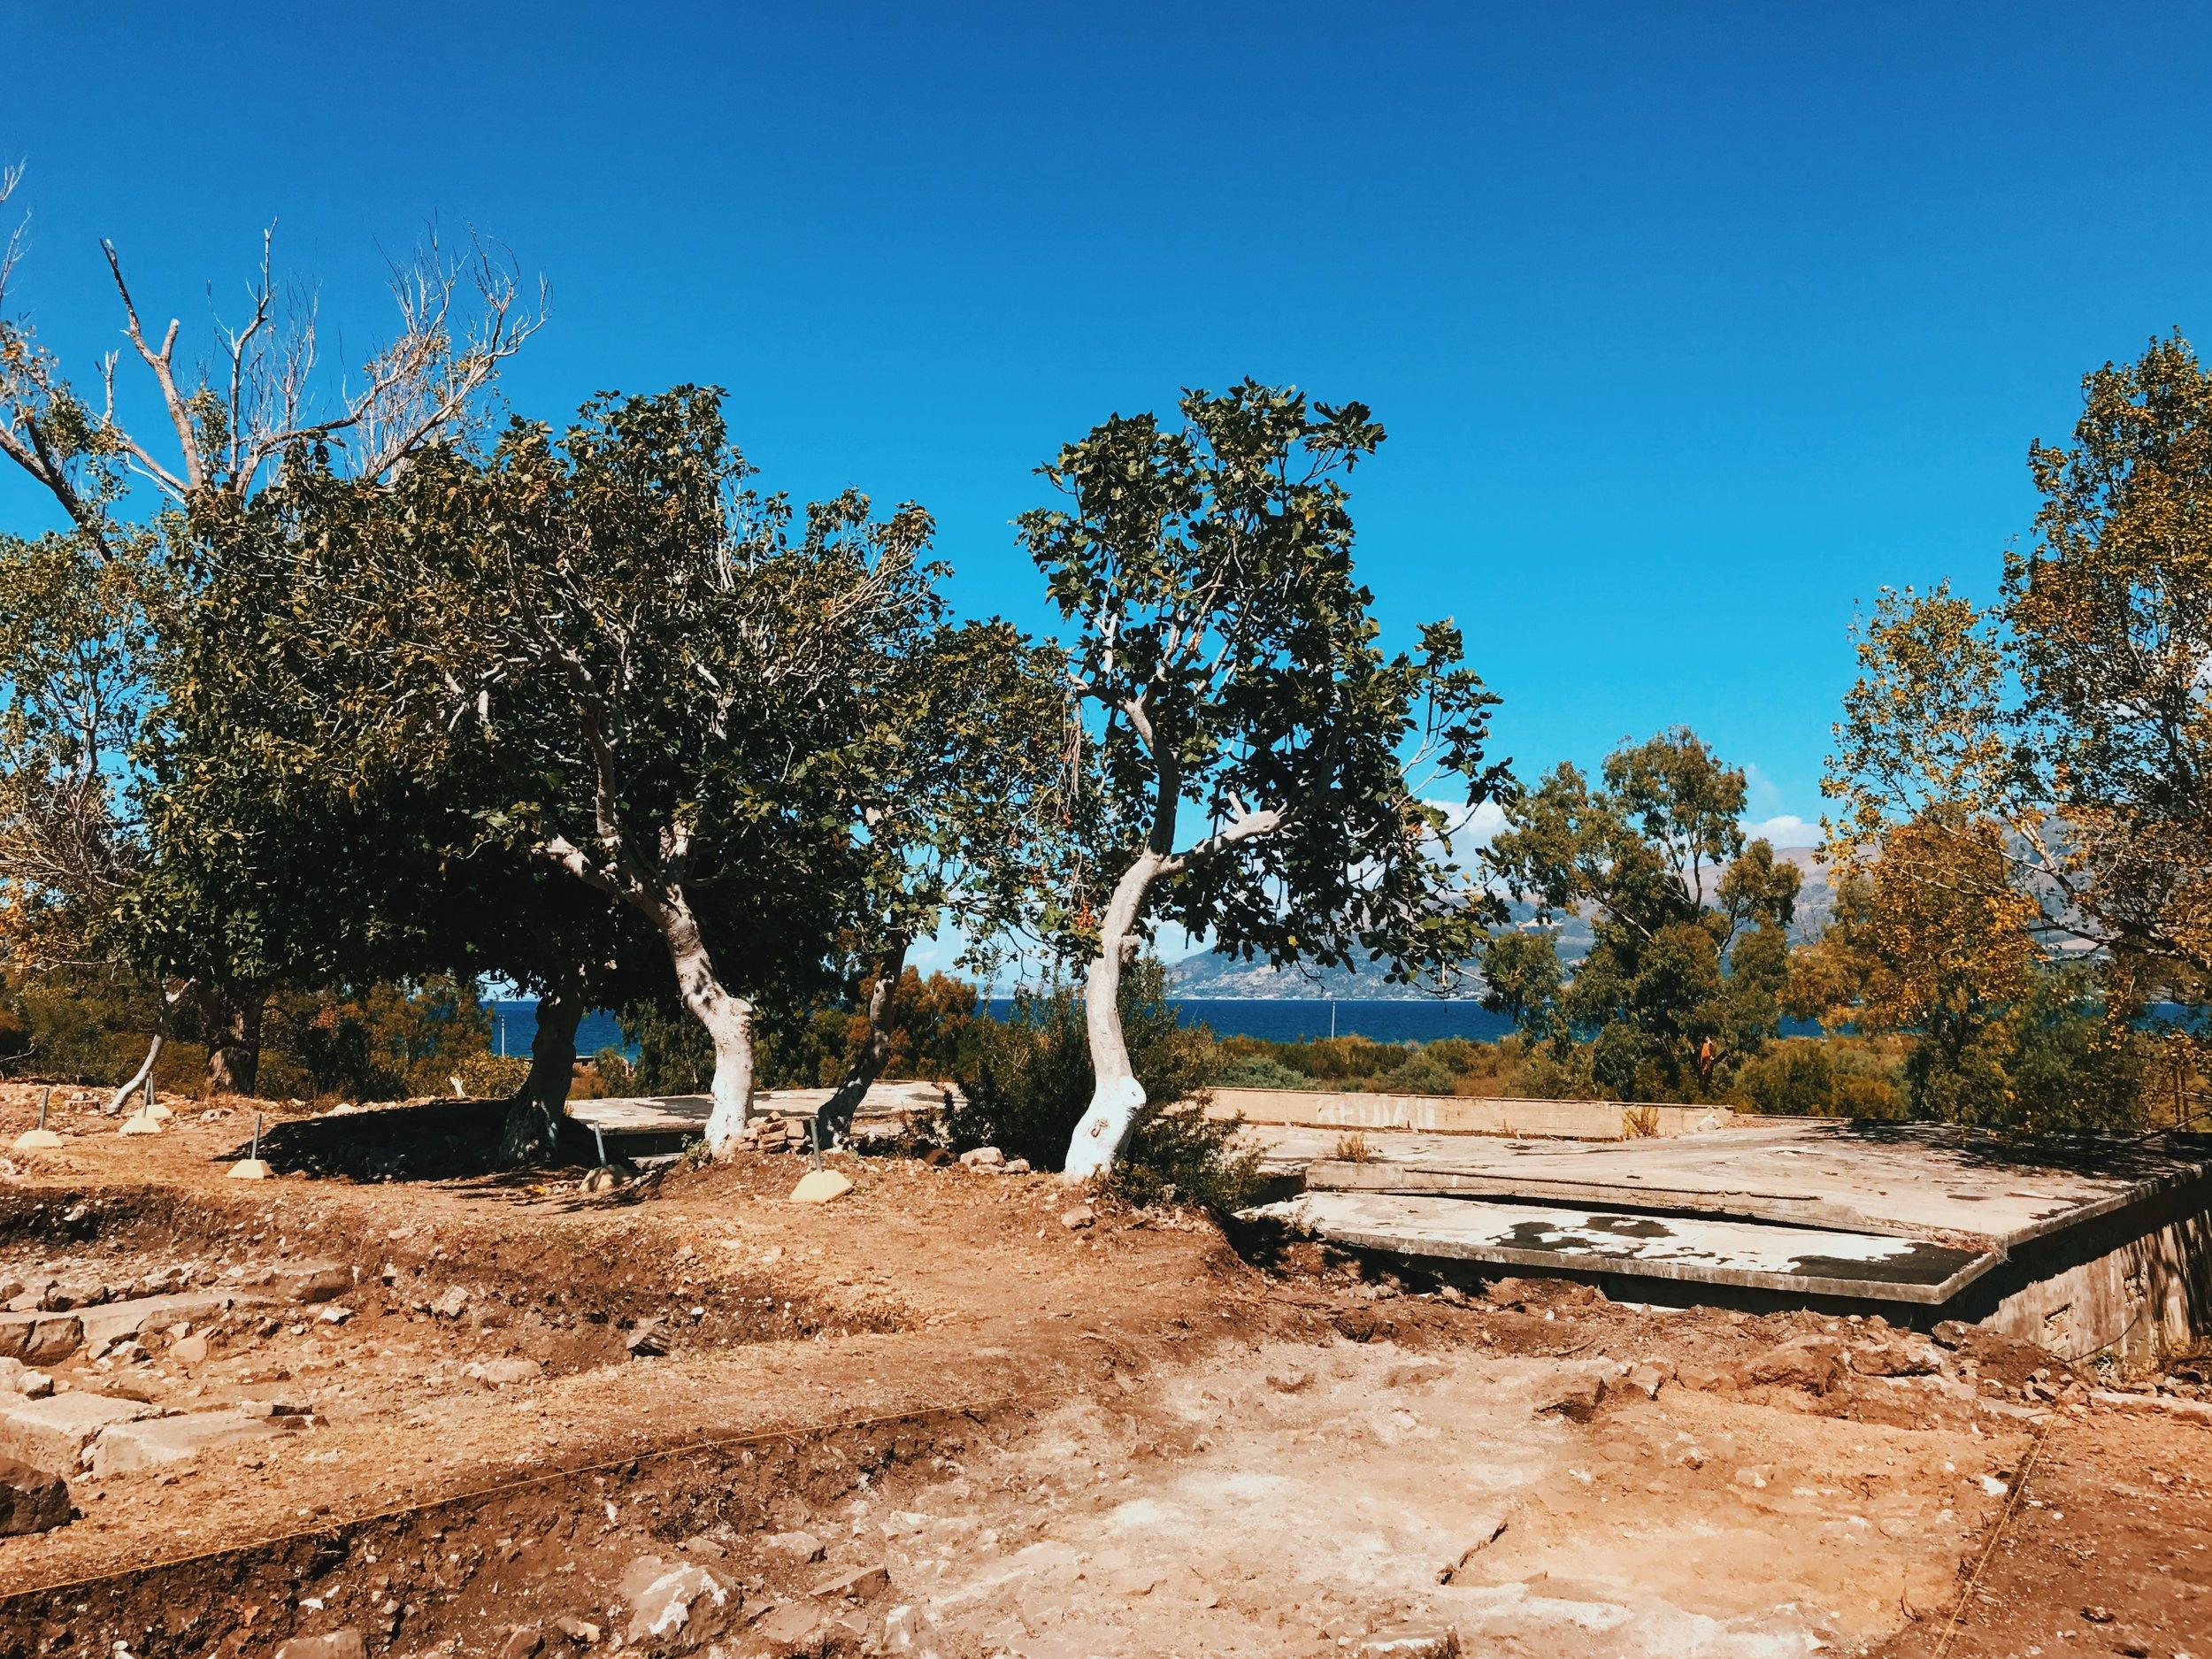 Archeological park in Orikum, Albania